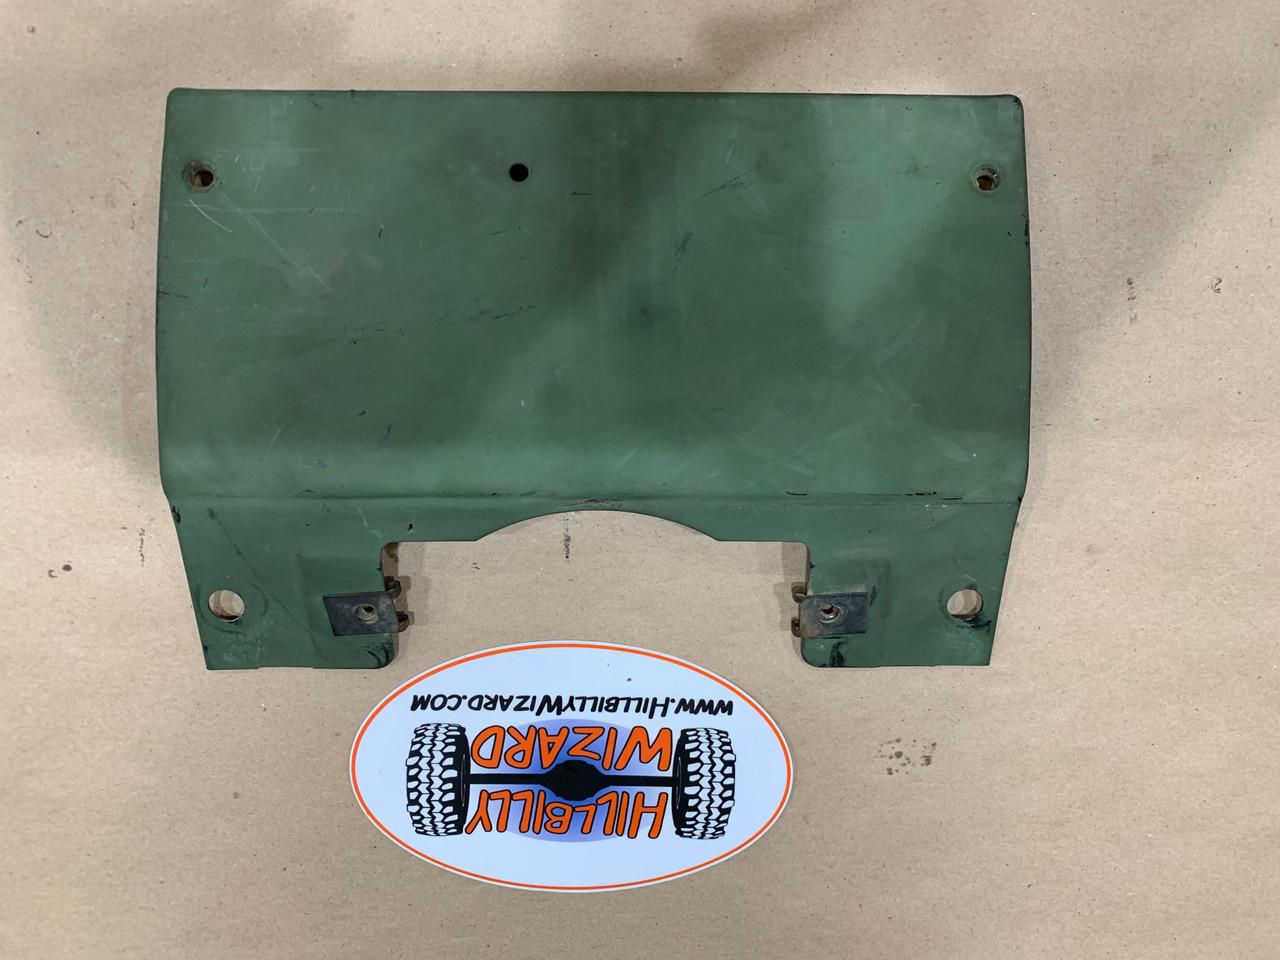 Used CUCV Dash Trim Plate